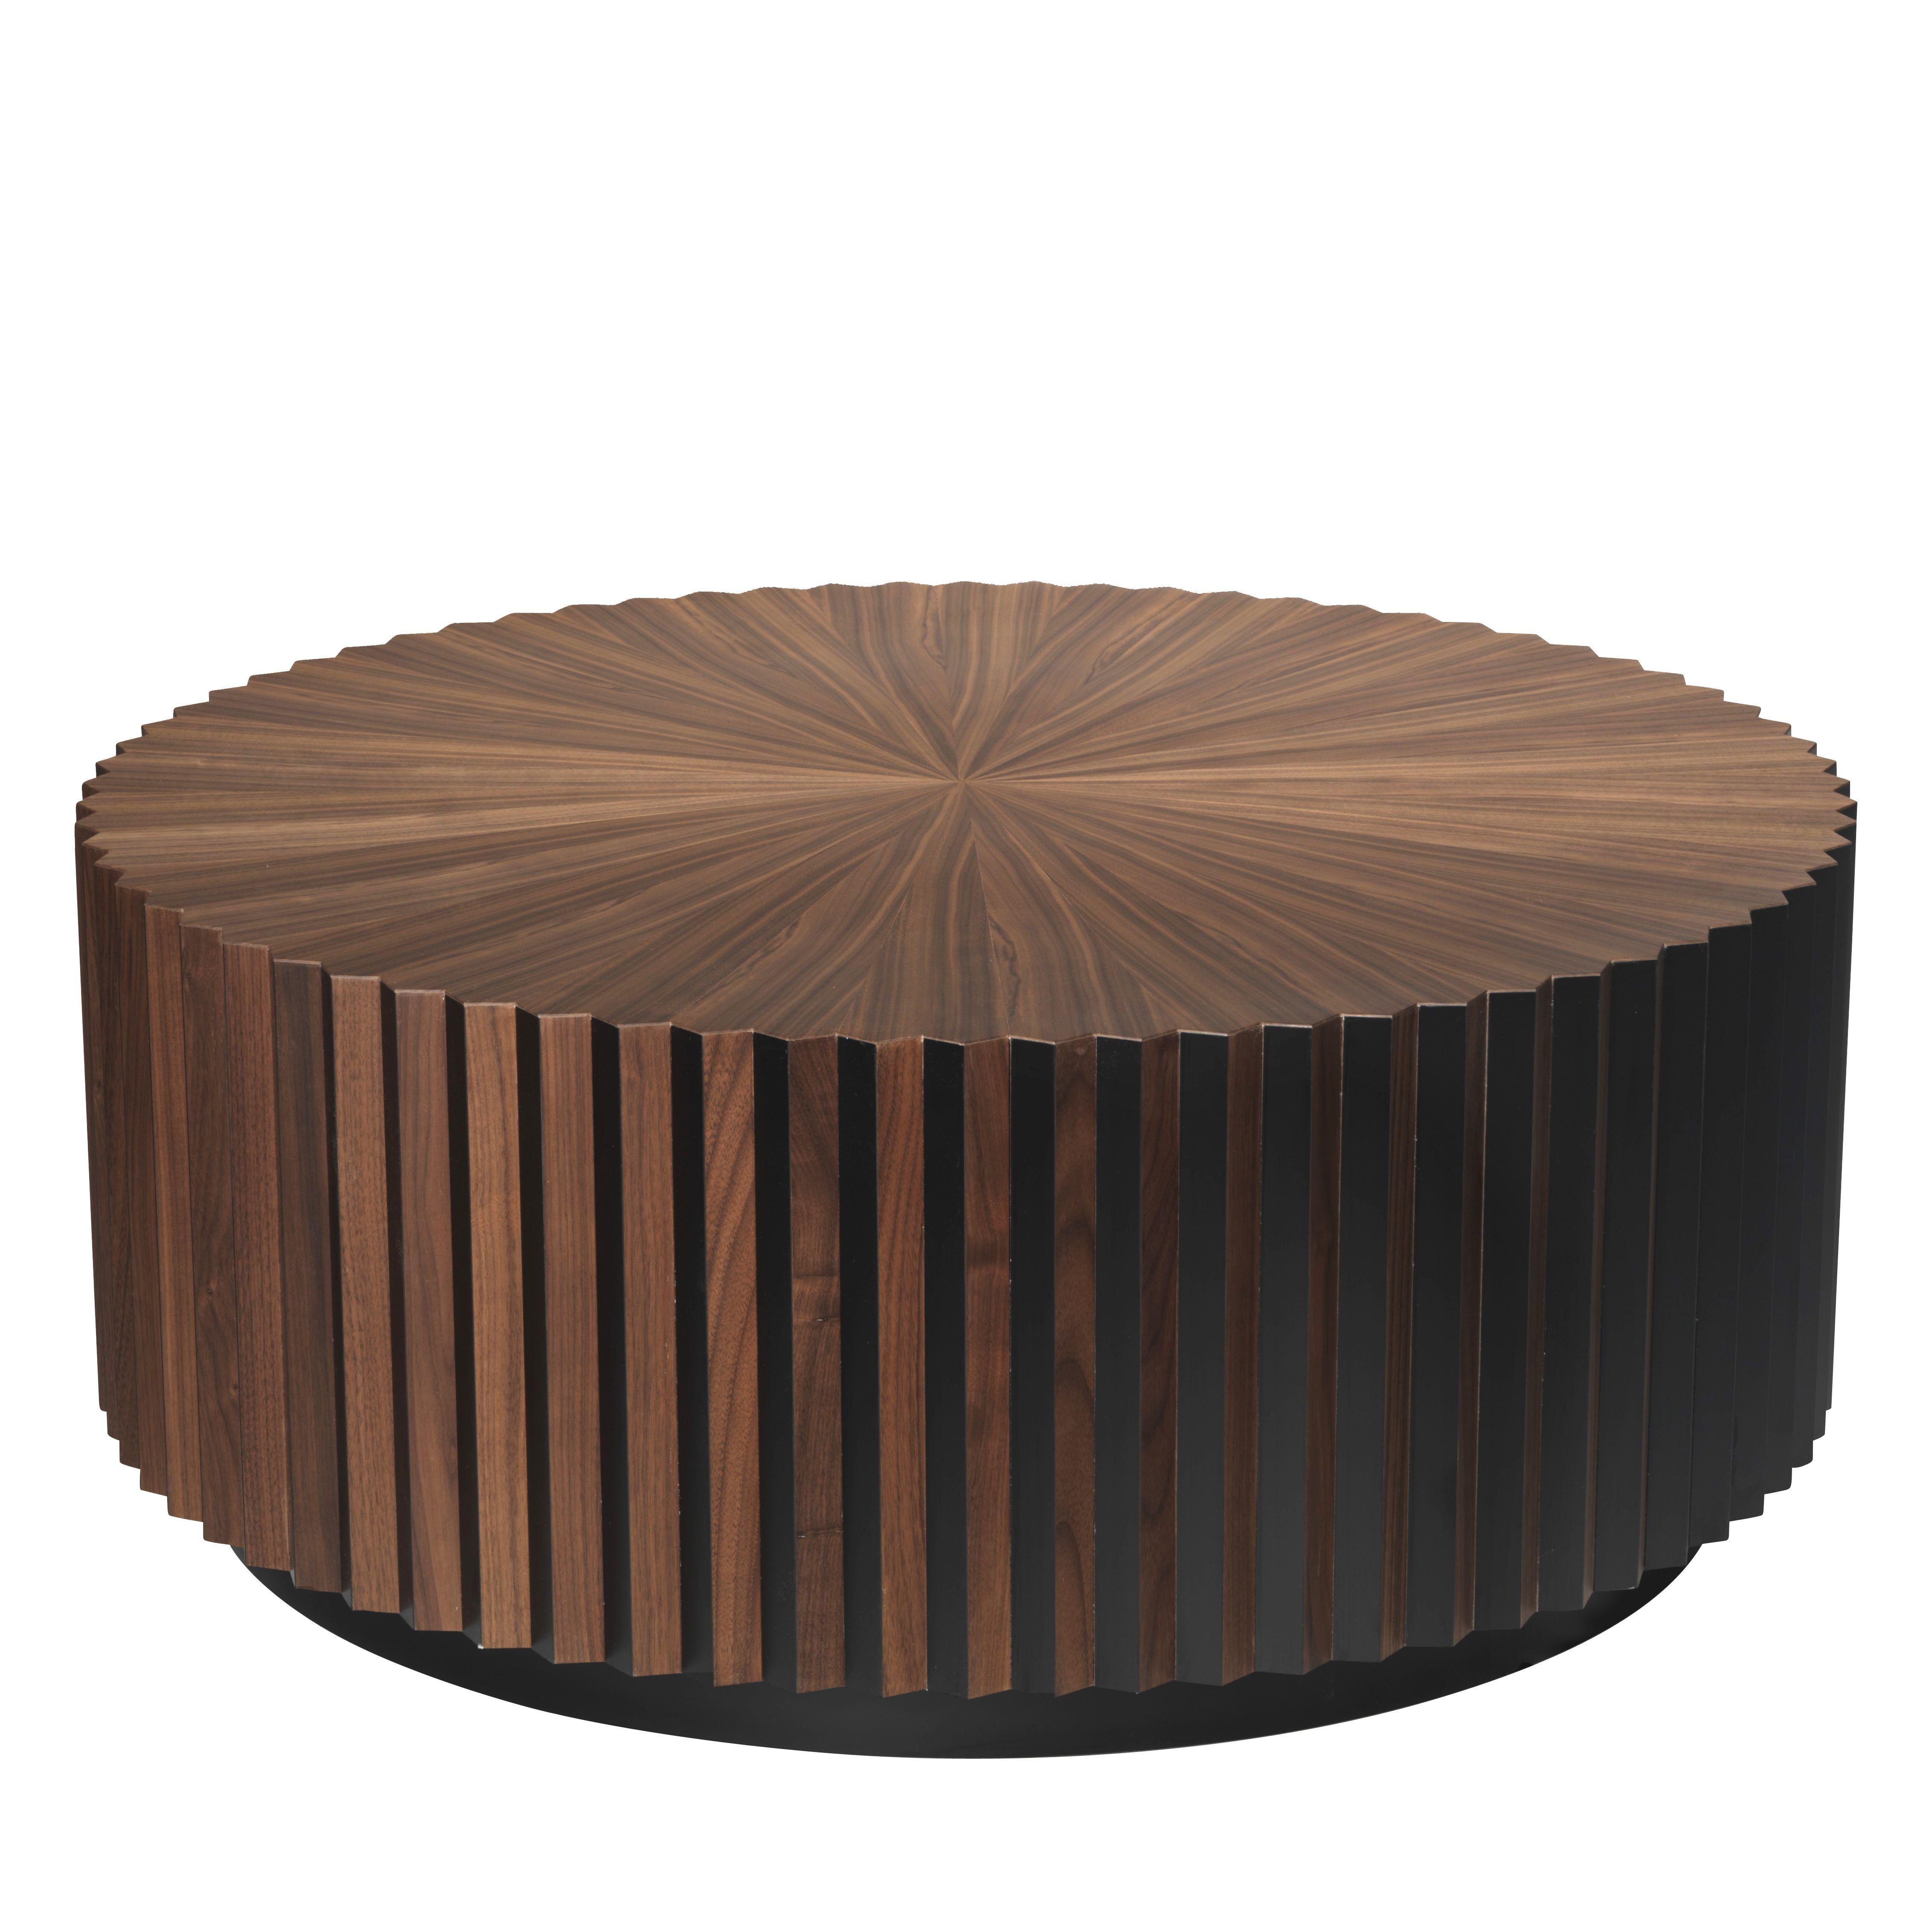 Shadow Coffee Table by Lee Broom on ECC